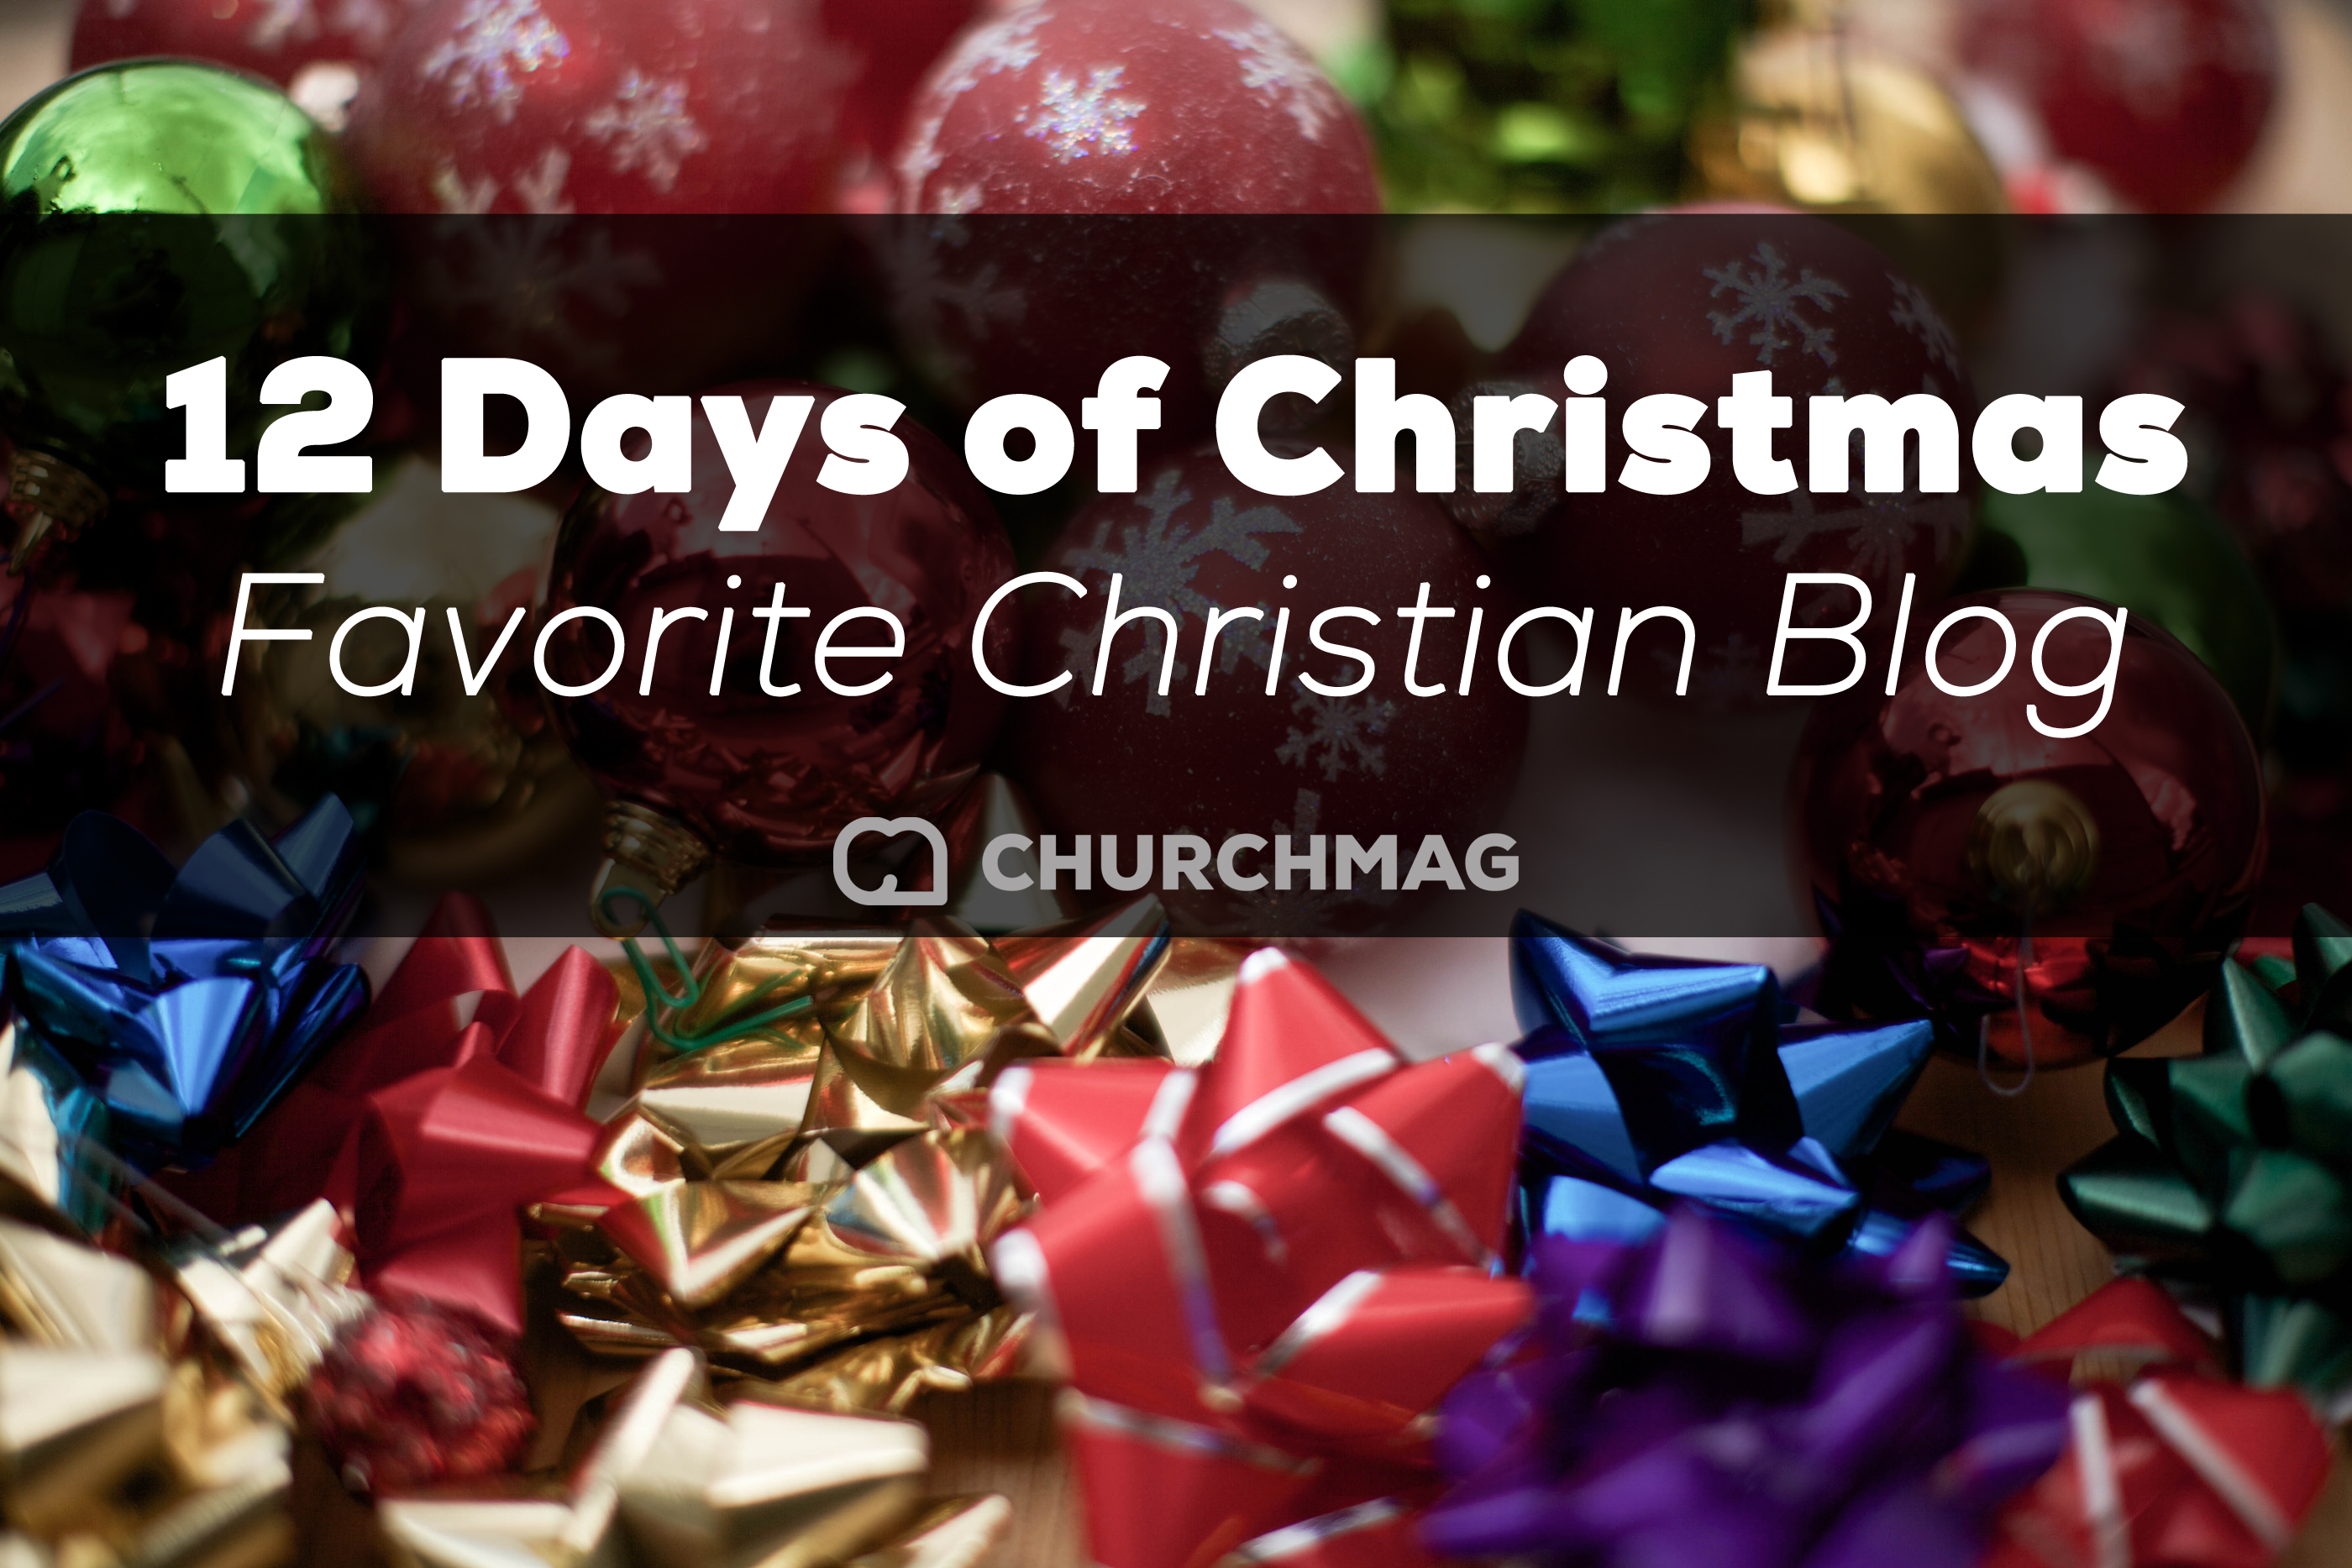 12 days of churchmag christmas favorite christian blog - 12 Days Of Christmas Christian Version